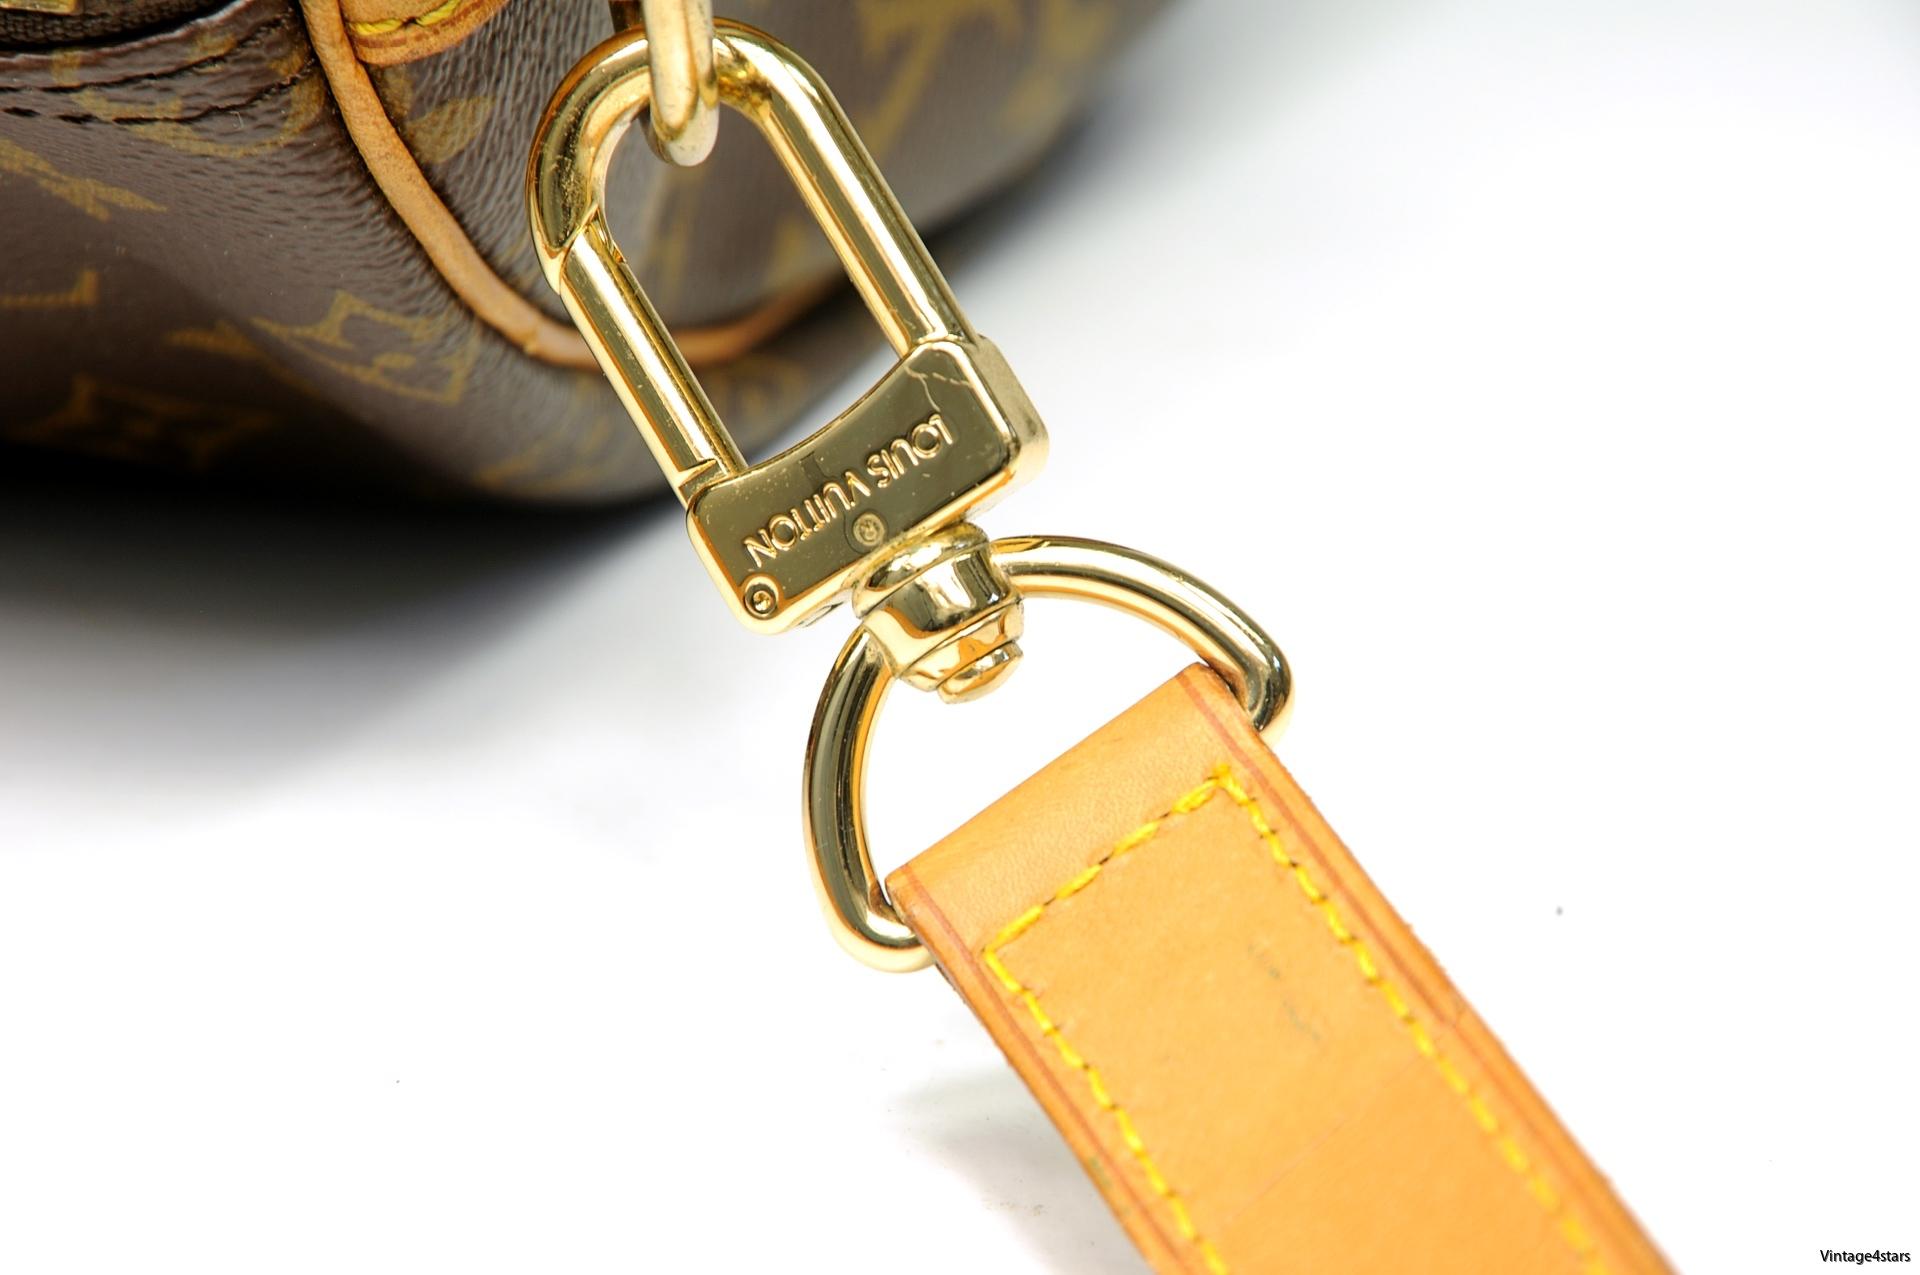 Louis Vuitton Keepall 55 Band 7a